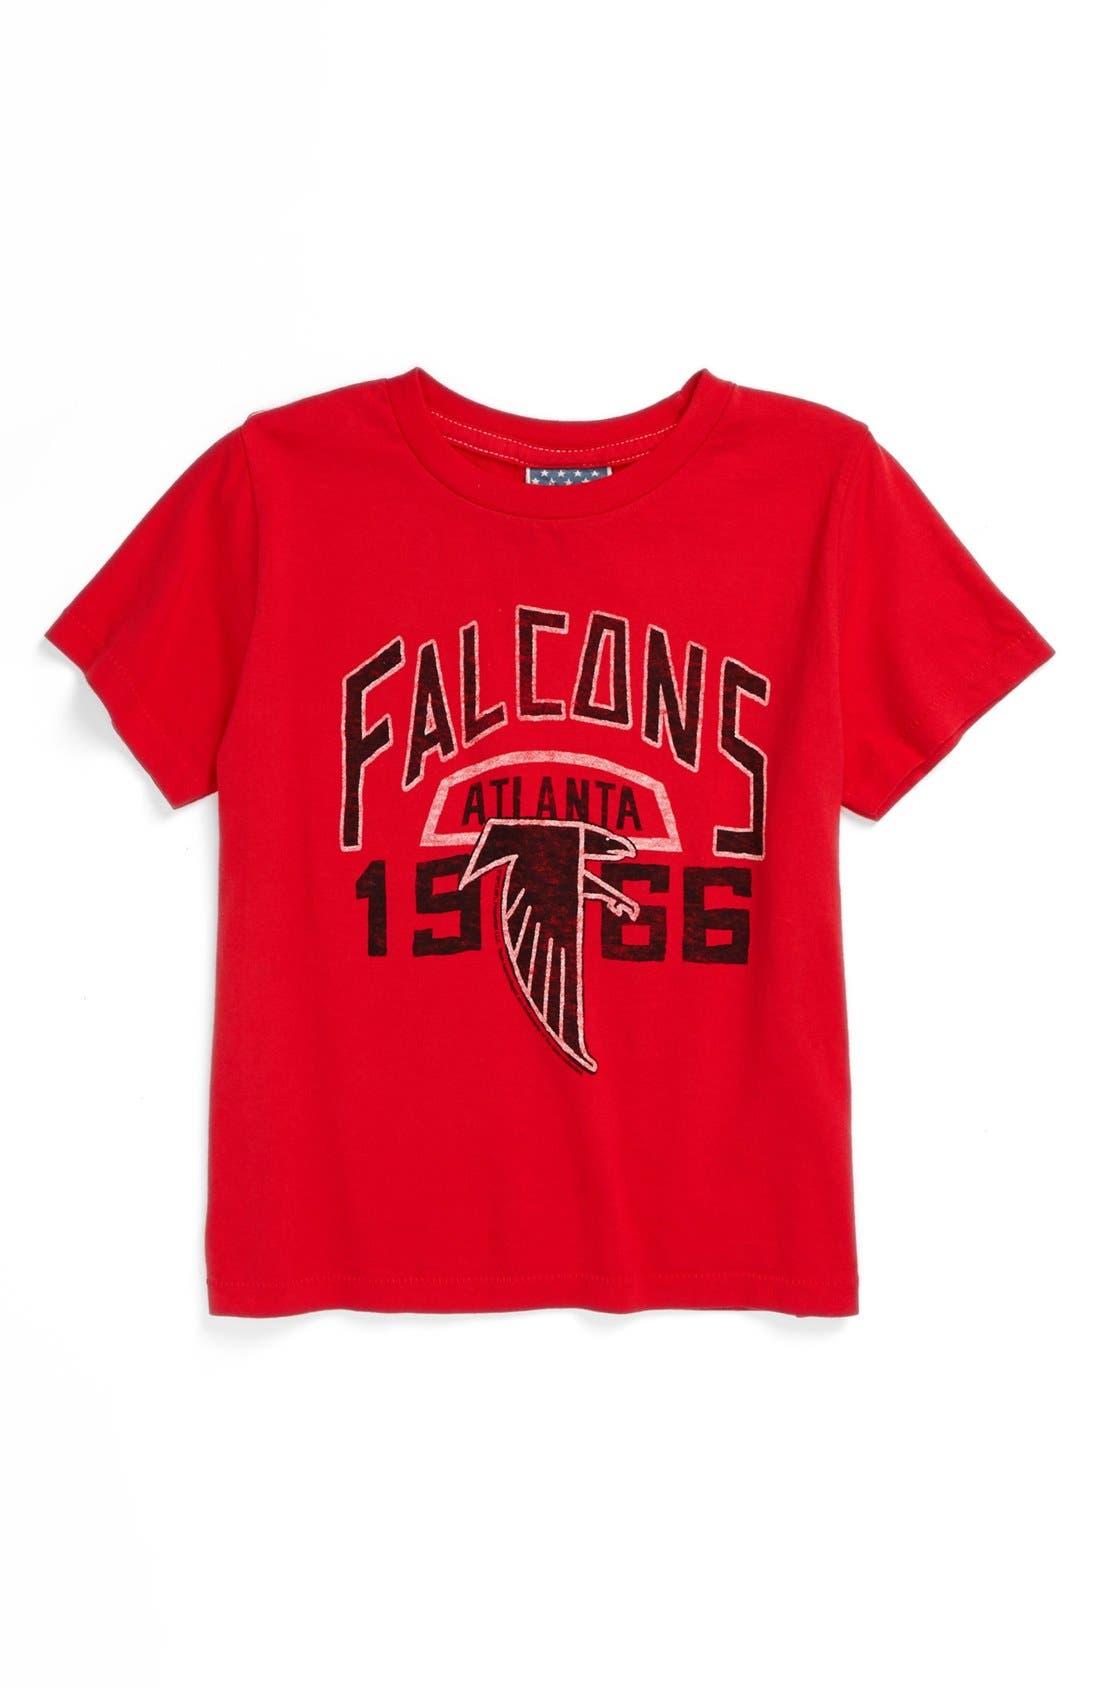 Alternate Image 1 Selected - Junk Food 'Atlanta Falcons' T-Shirt (Toddler Boys)